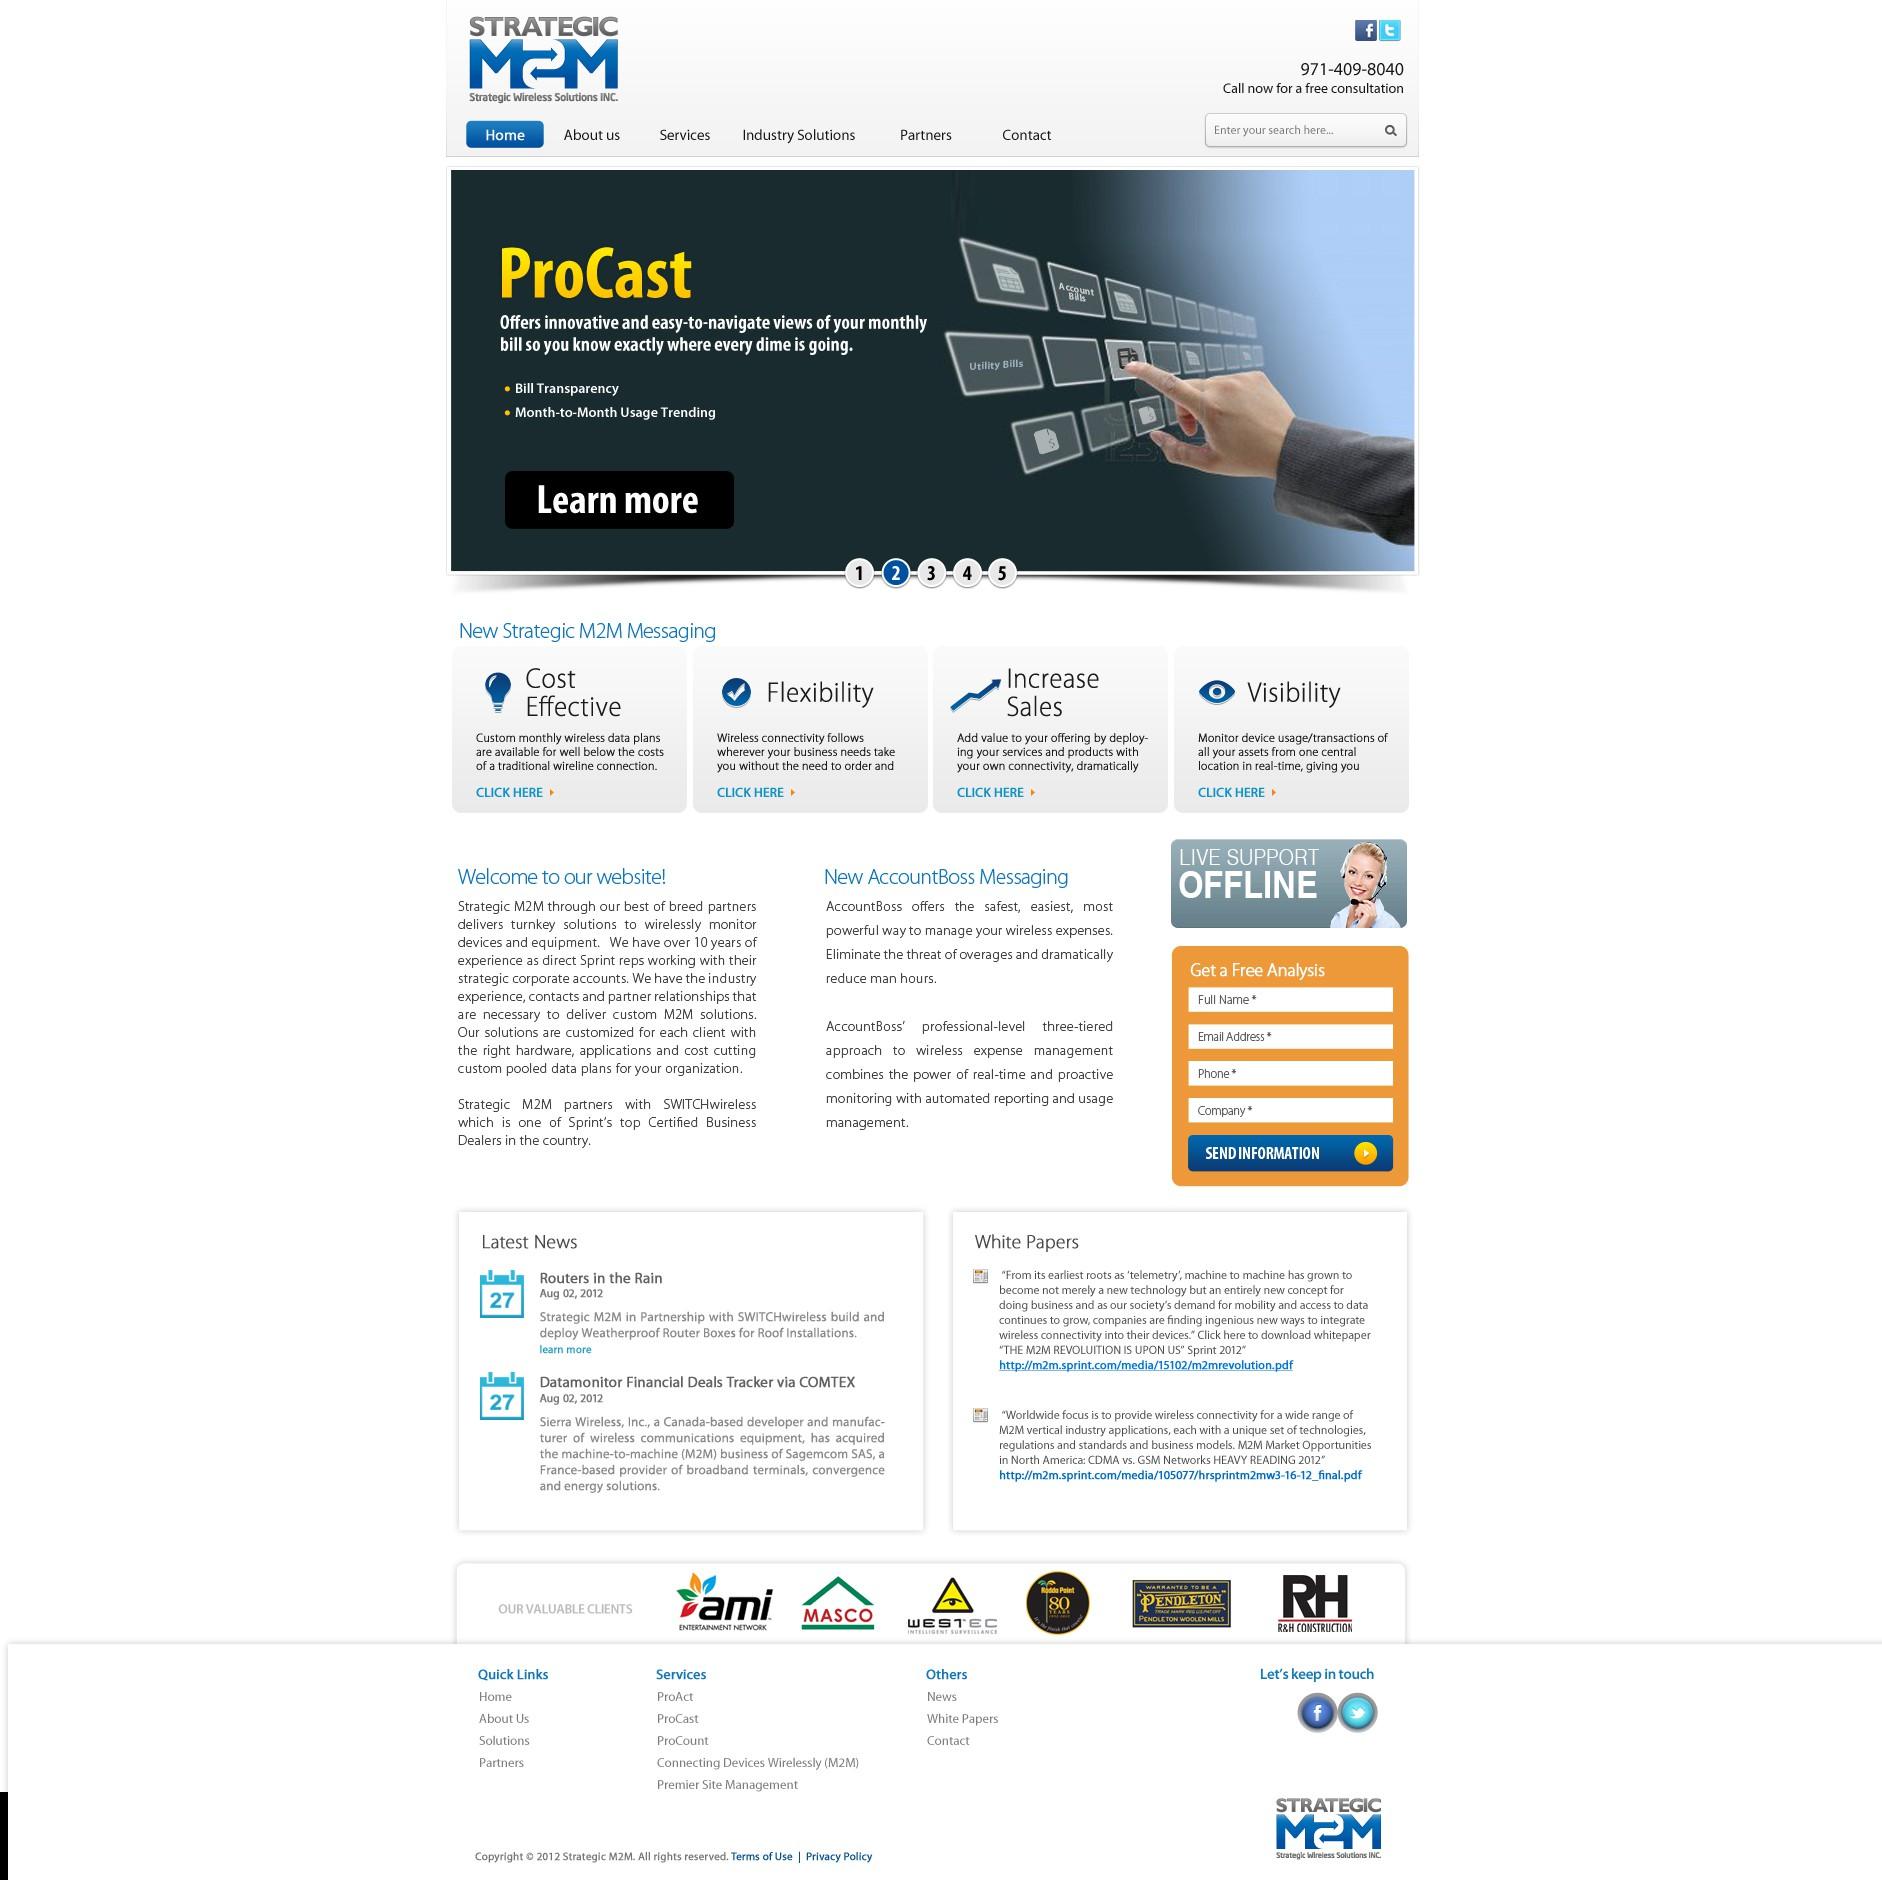 New website design wanted for Strategic M2M www.strategicm2m.com